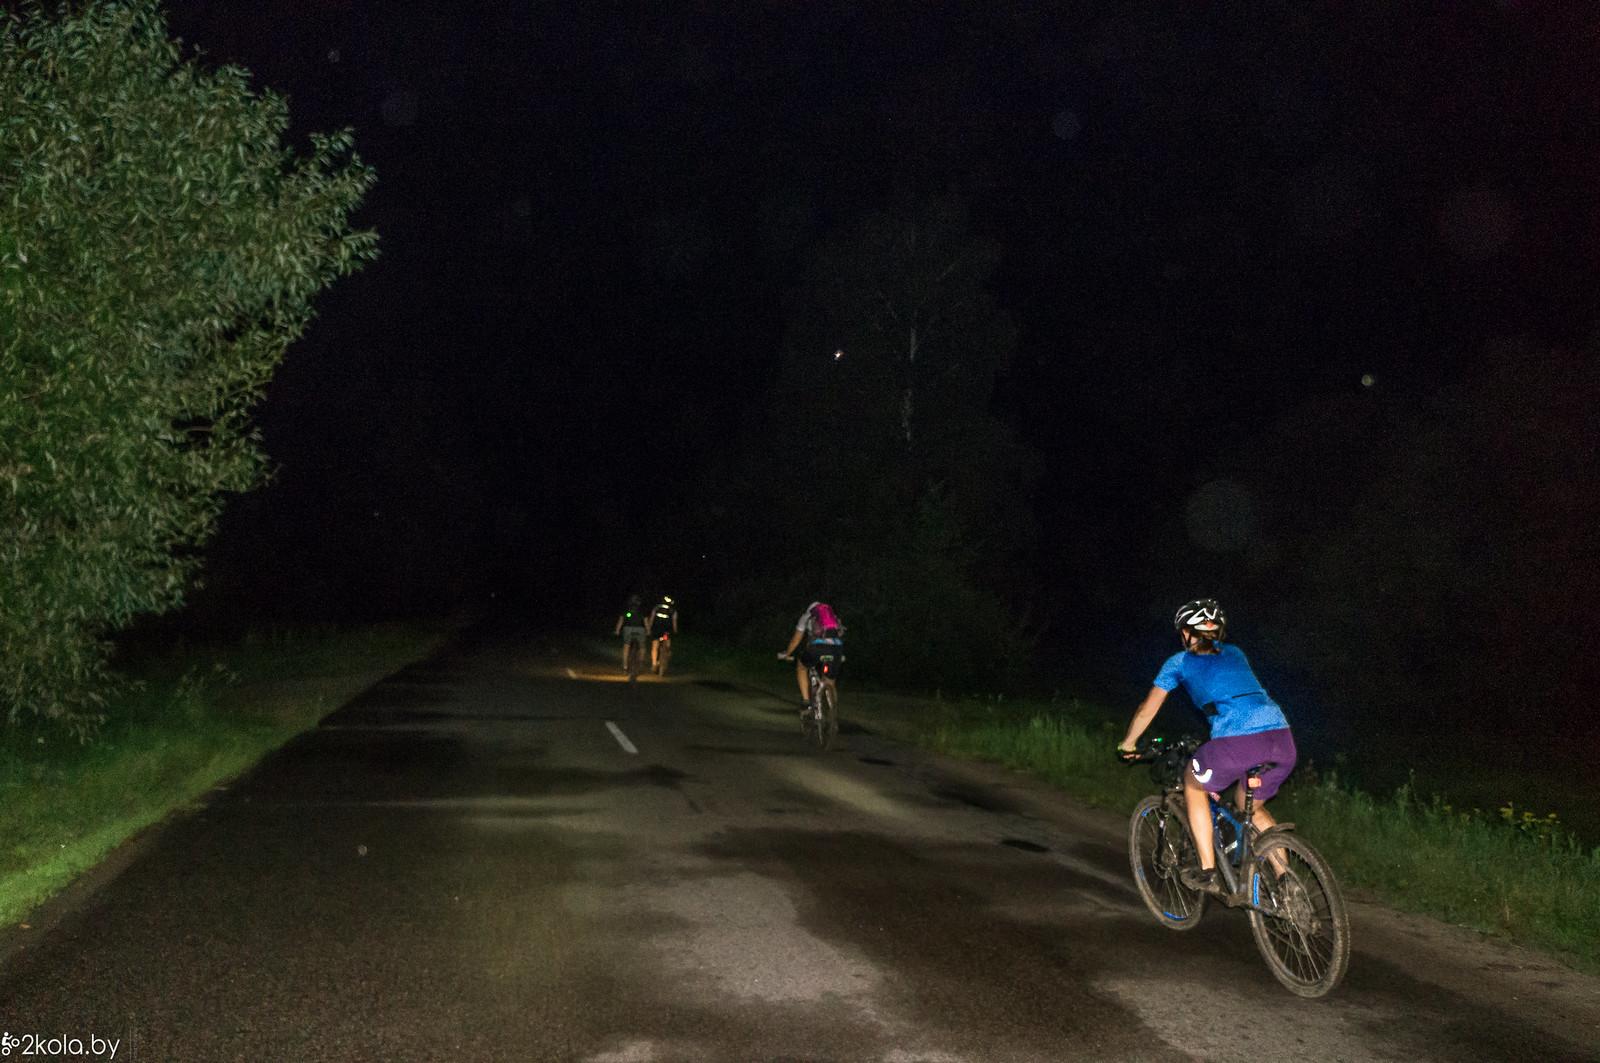 36000881450 596f59e1c7 h - Ночная велопокатушка 2017 (Тимковичи - Люща)